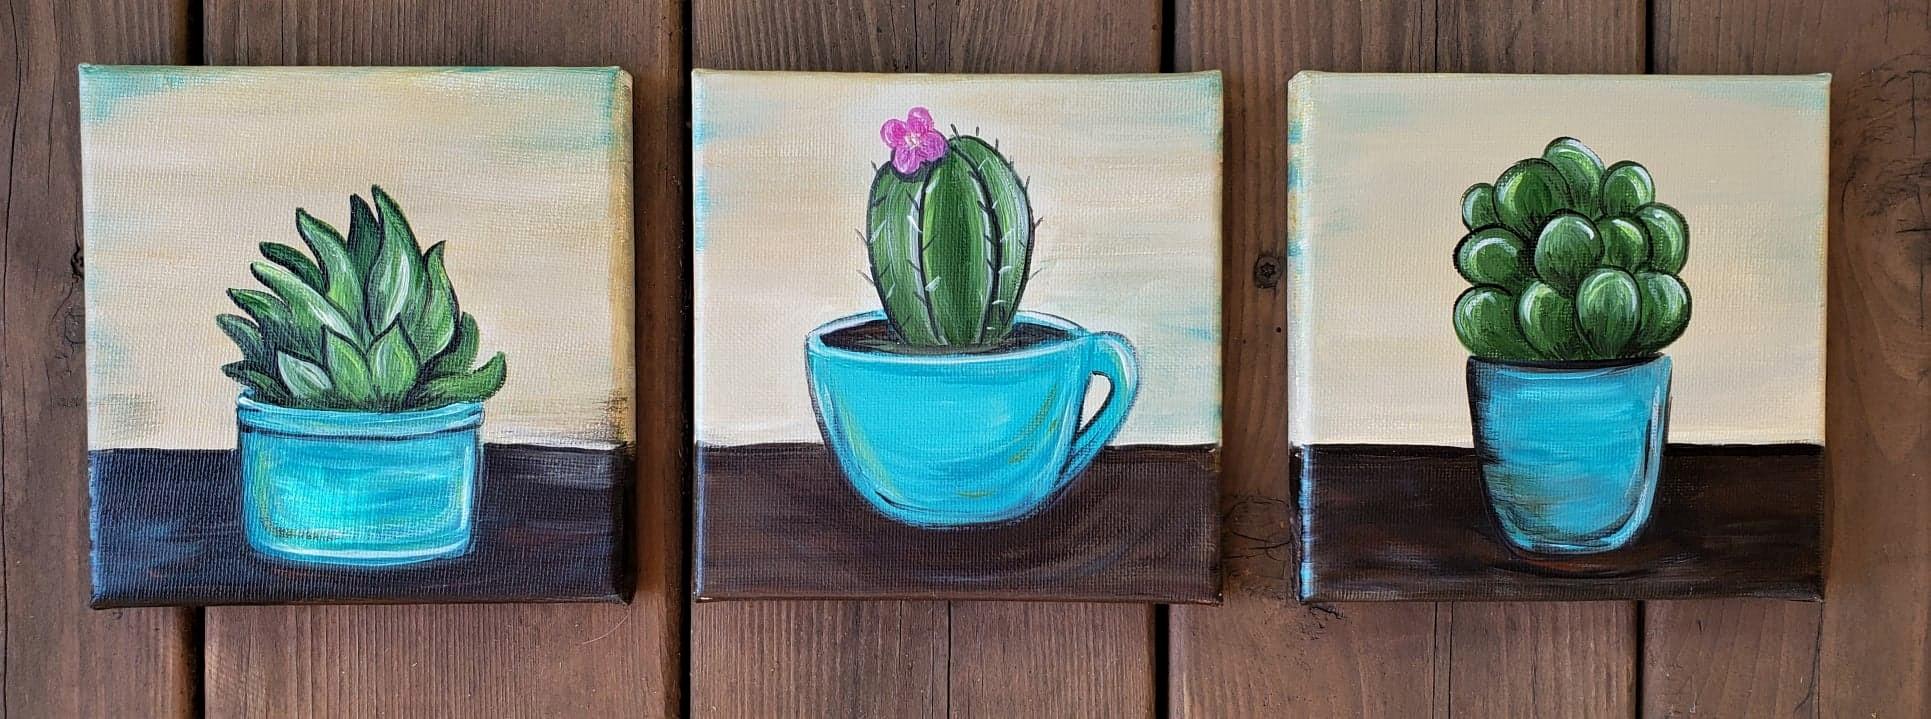 3 succulents.jpg